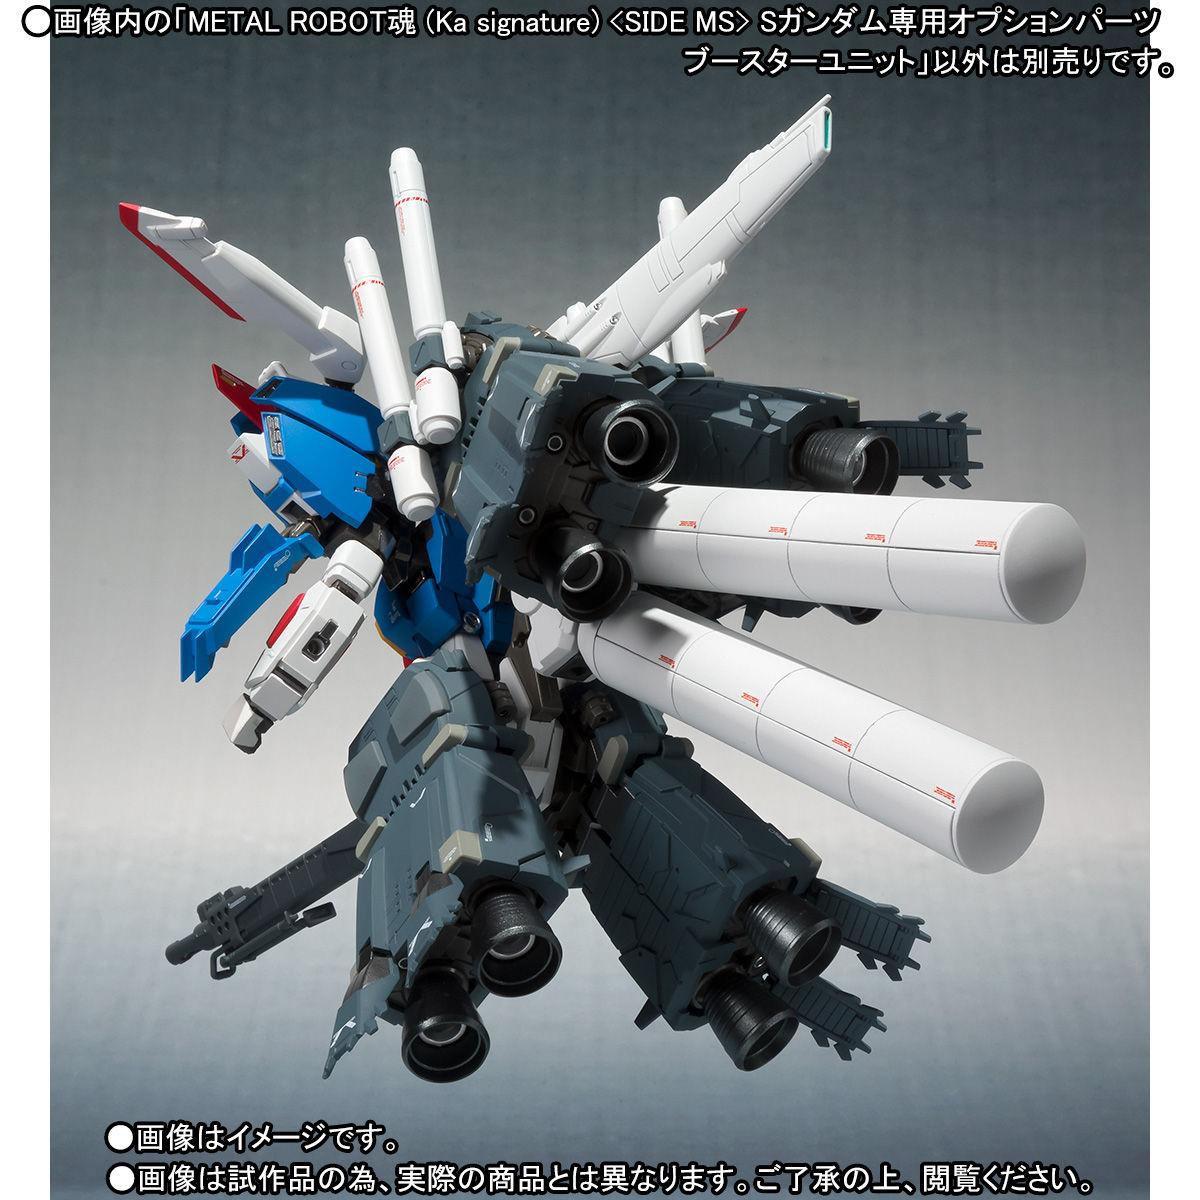 METAL ROBOT魂(Ka signature)<SIDE MS>『Sガンダム専用オプションパーツ ブースターユニット』オプションパーツ-003